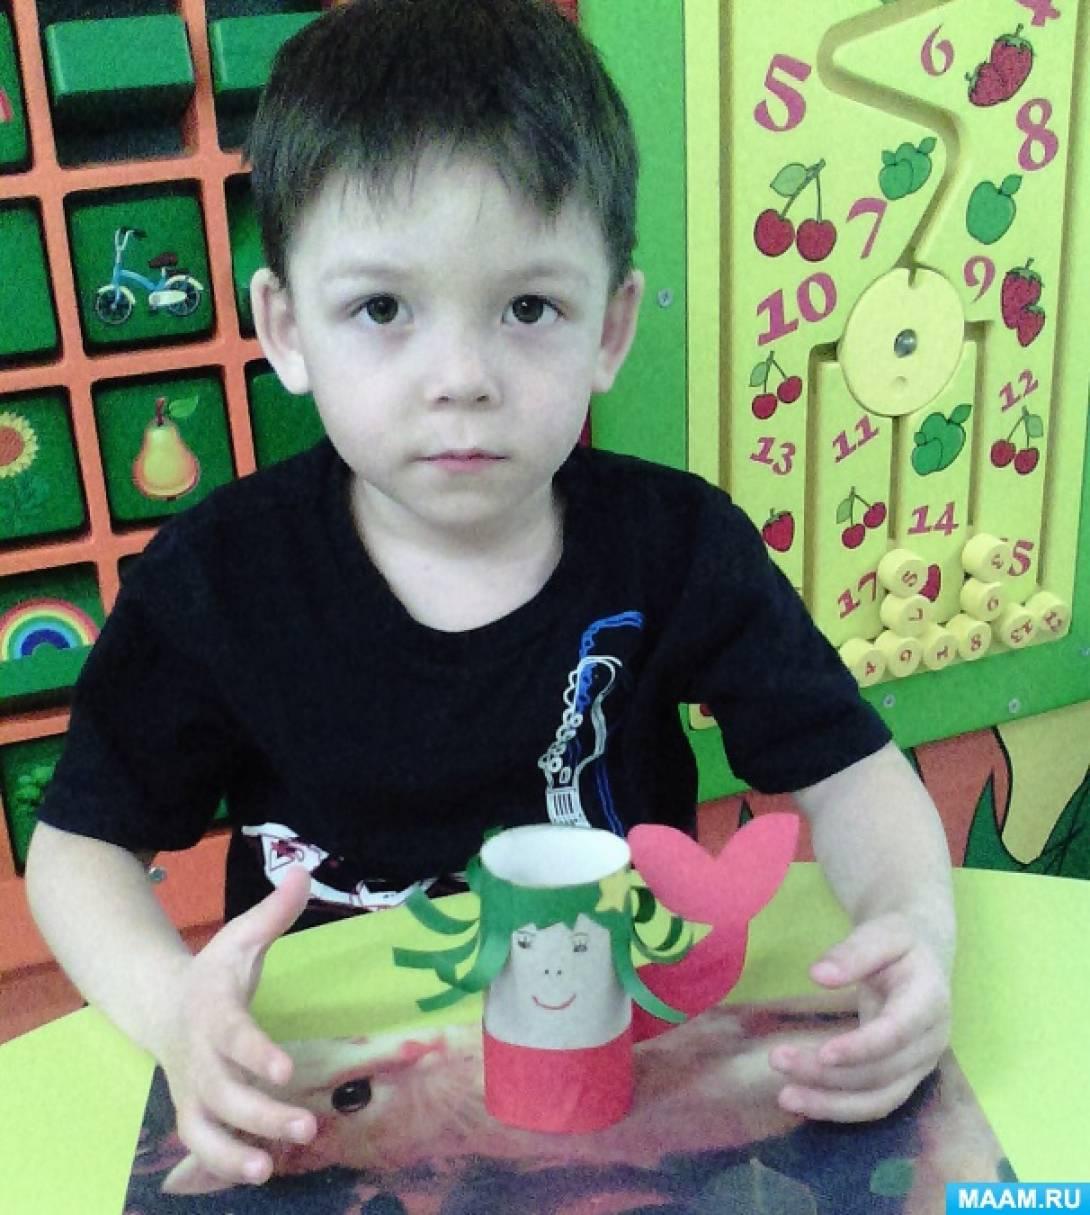 Детский мастер-класс от Марселя «Русалка»